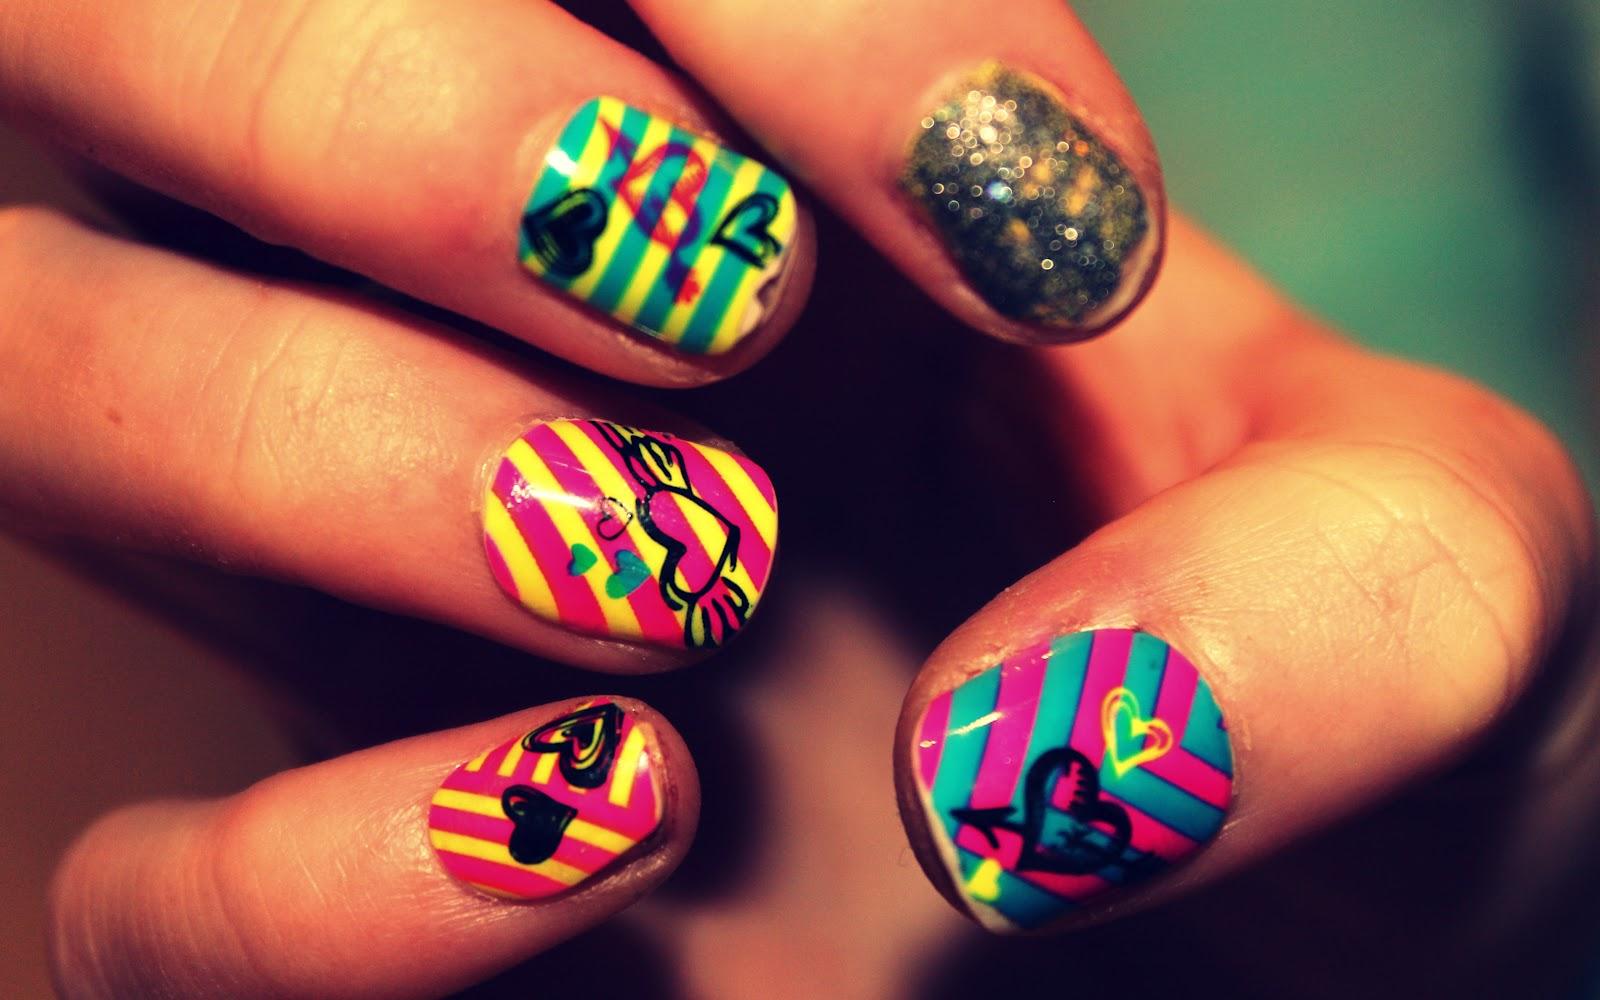 US nail brand imPRESS hits UK shores with imPRESS press on nails ...